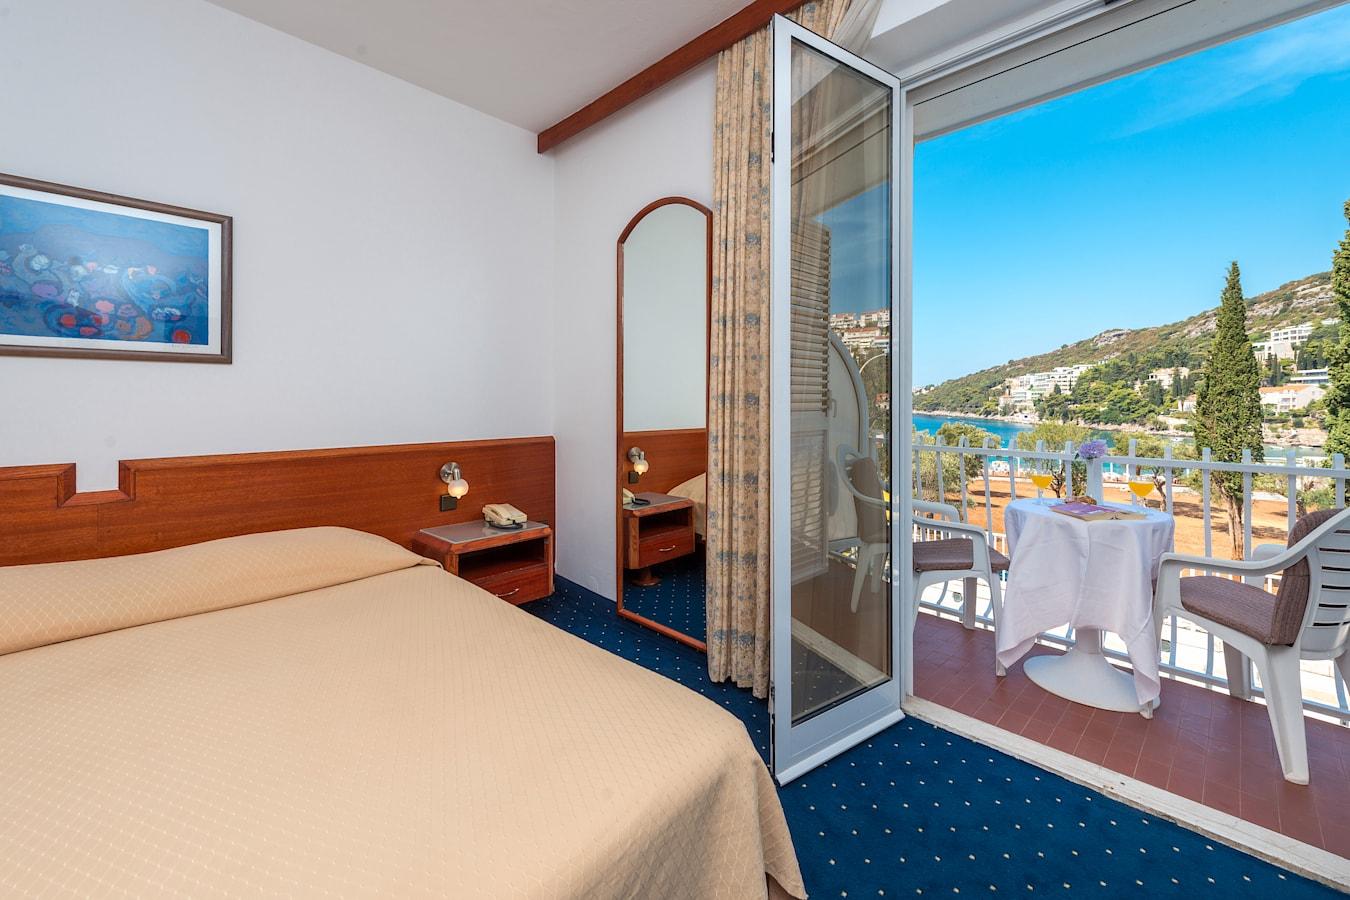 komodor-hotel-double-room-balcony-seaview-dubrovnik.jpg